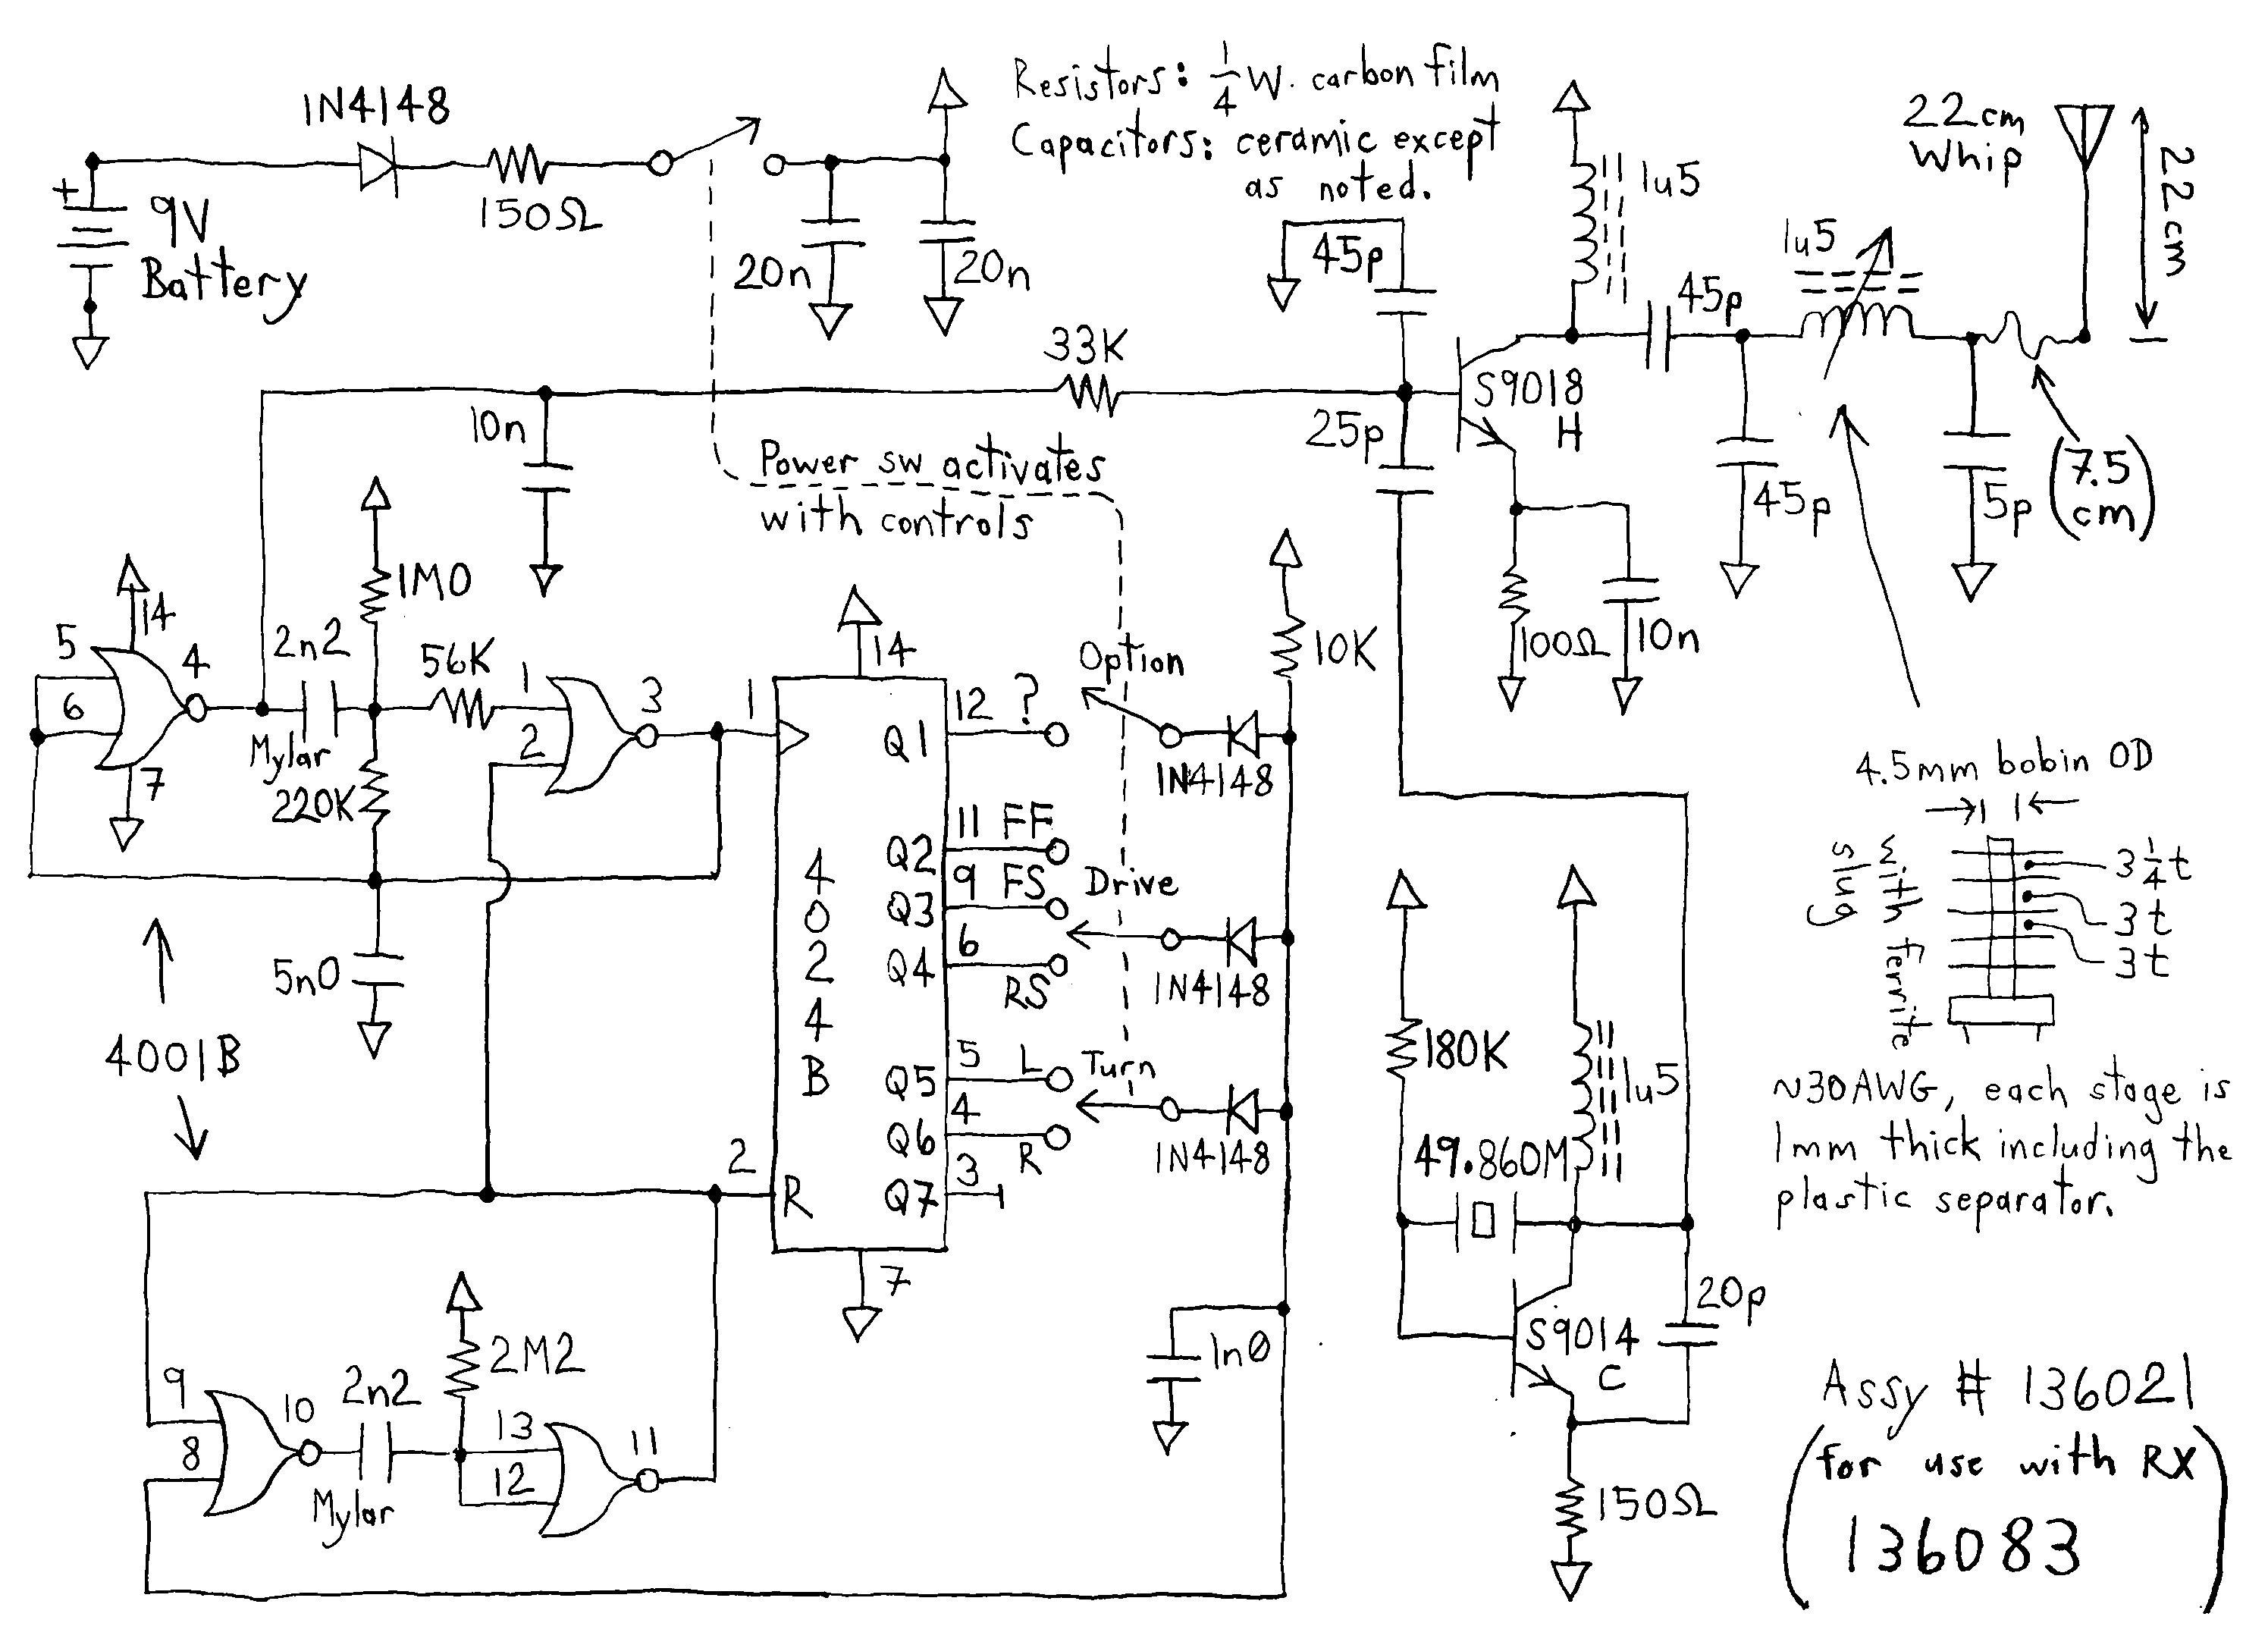 Box De Marc Wiring Diagram on box dimensions diagram, box engine diagram, box fan diagram, box frame diagram, box wiring globe, box parts diagram, box motor, box heater, box brochure,